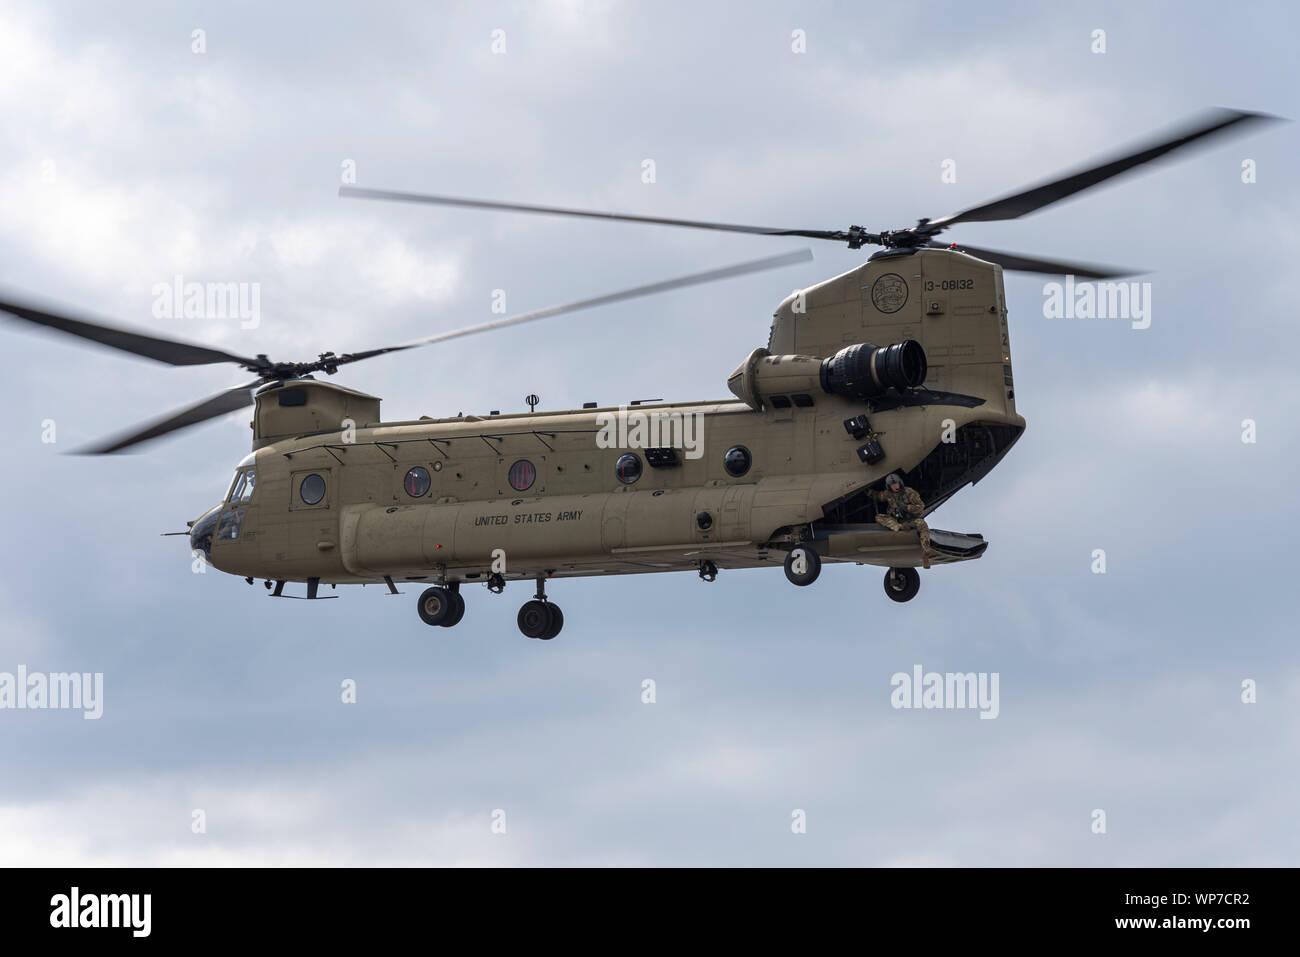 US Army Boeing CH-47F Chinook atterrissant à Defence & Security Equipment International DSEI foire aux armements trade show, ExCel, Londres, Royaume-Uni. Homme d'équipage Banque D'Images